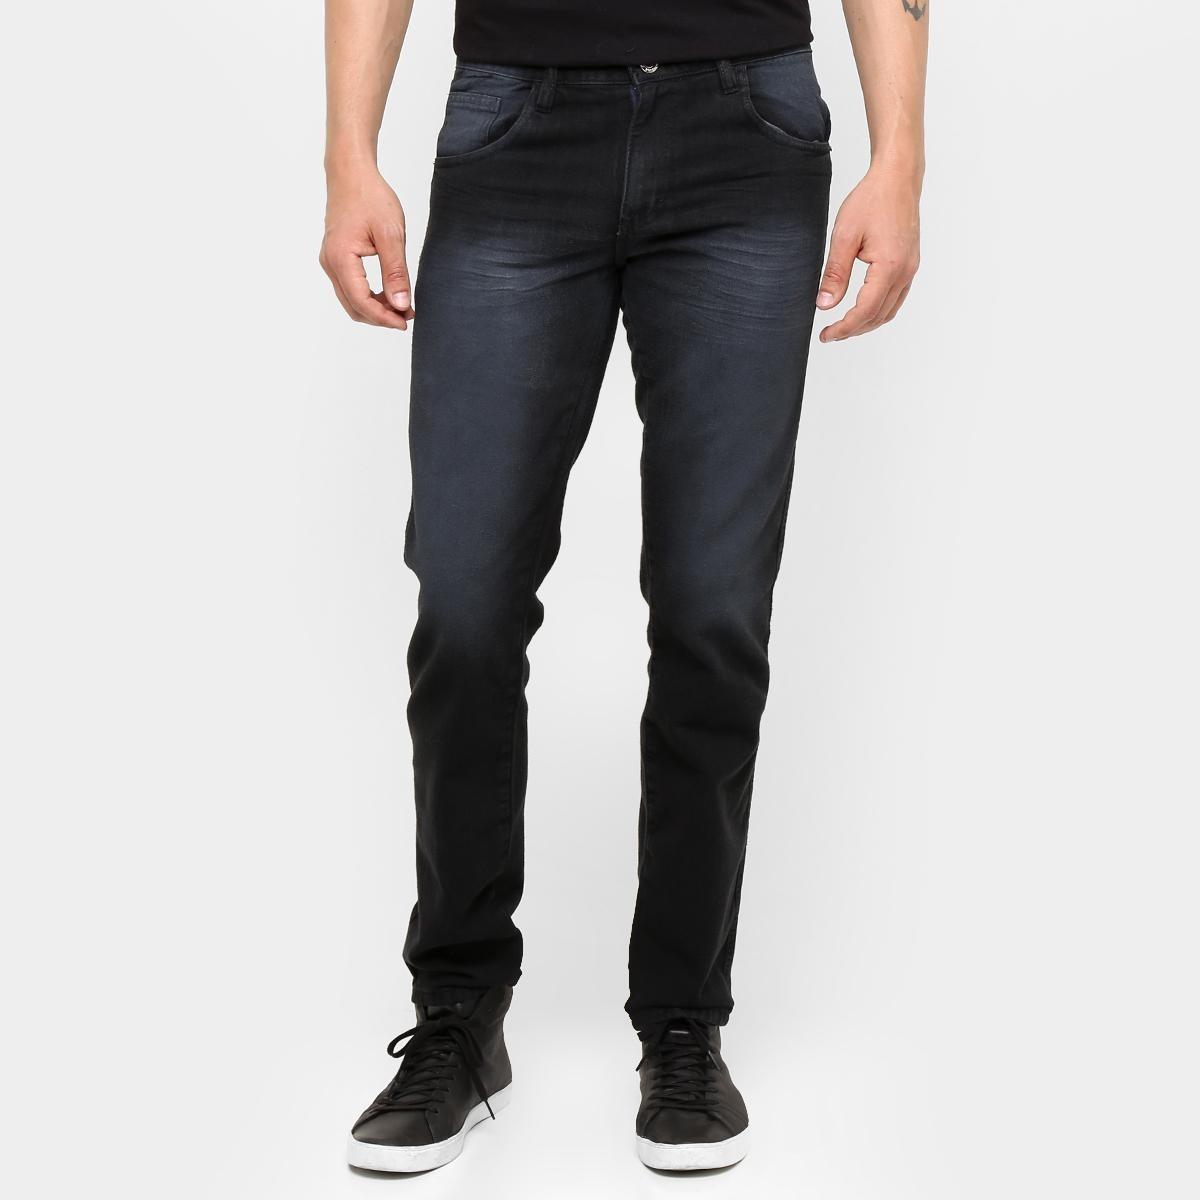 edc03ceb8 calça jeans skinny preston estonada black masculina. Carregando zoom.